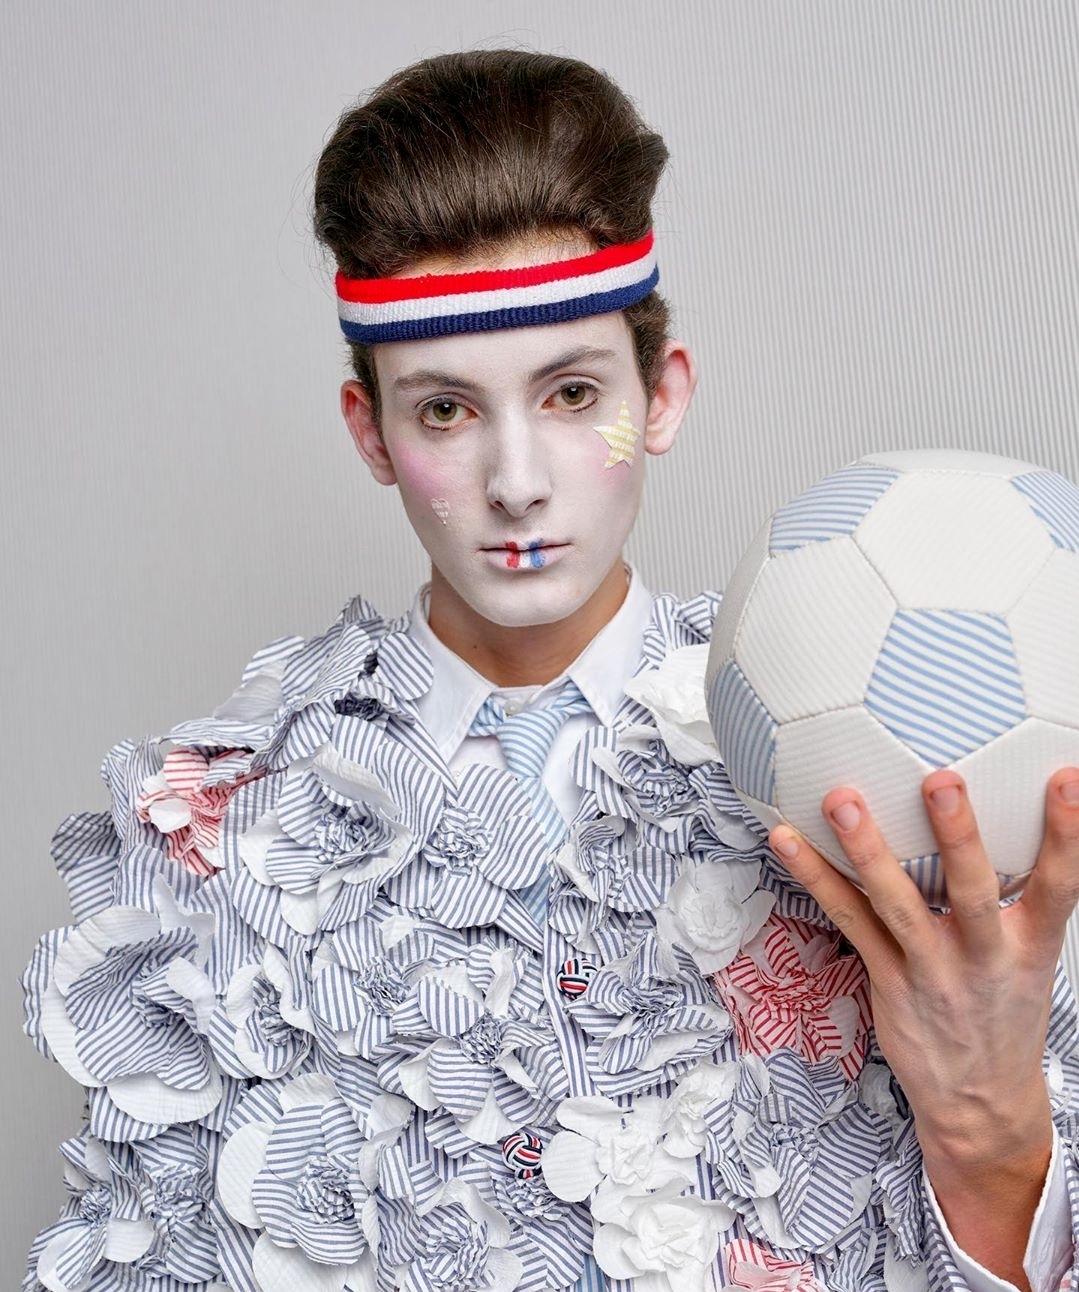 Образ из коллекции Thom Browne Spring/Summer 2020 Menswear